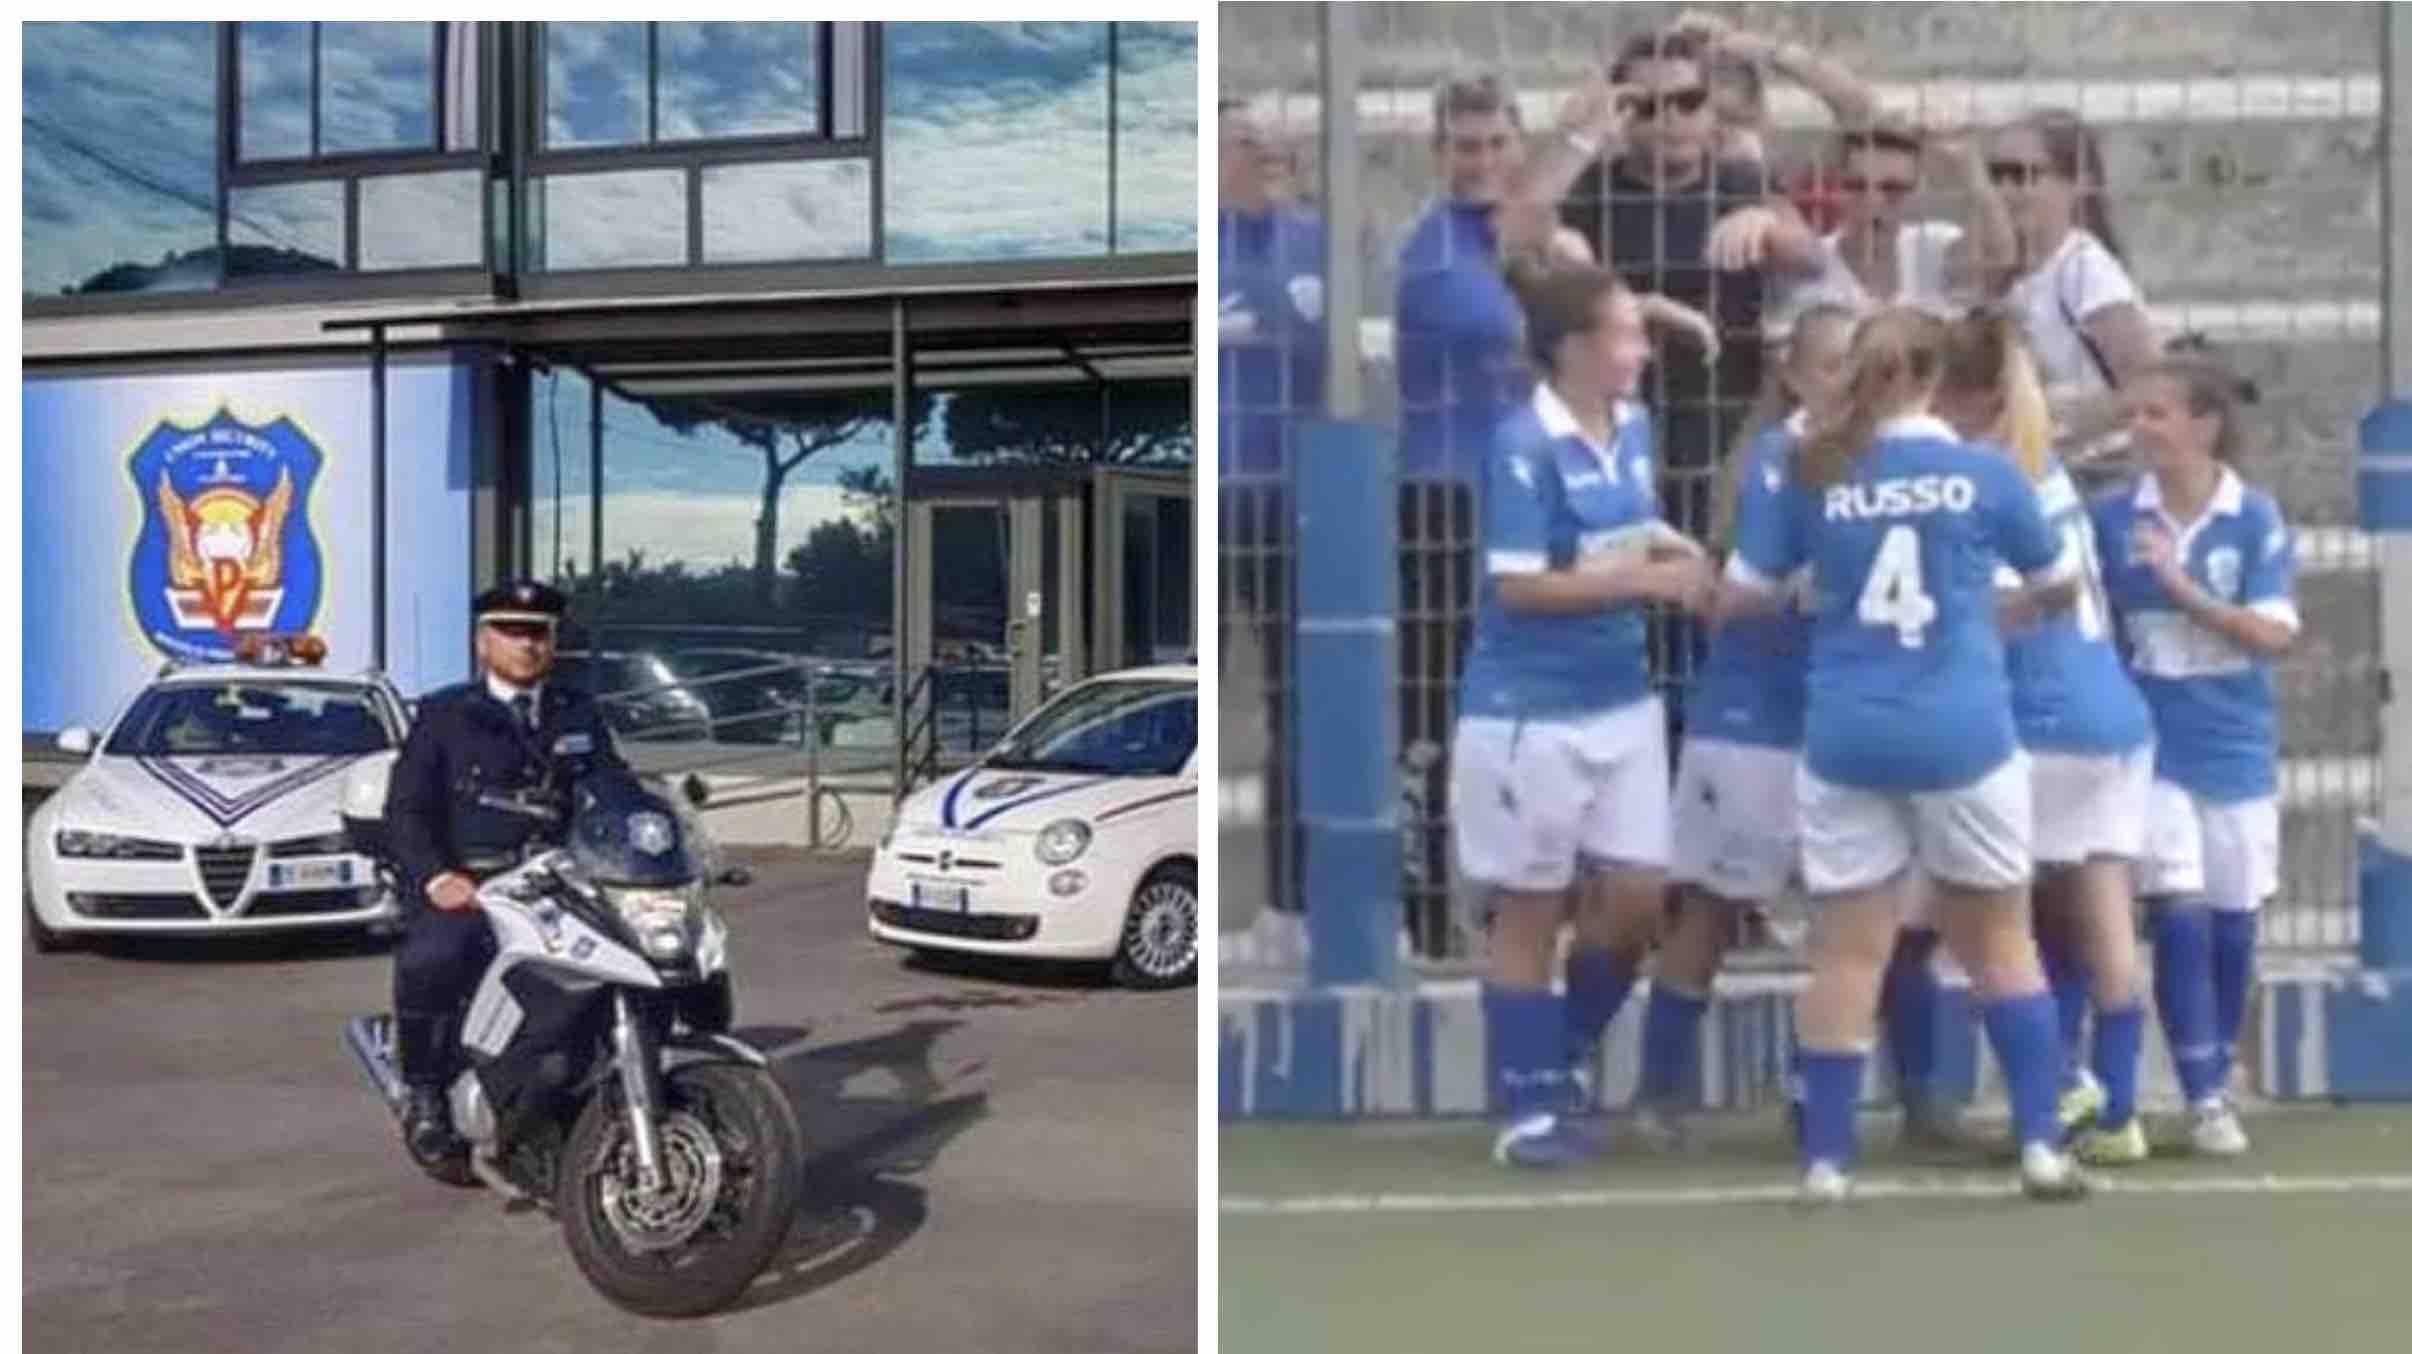 calcio napoli femminile union security